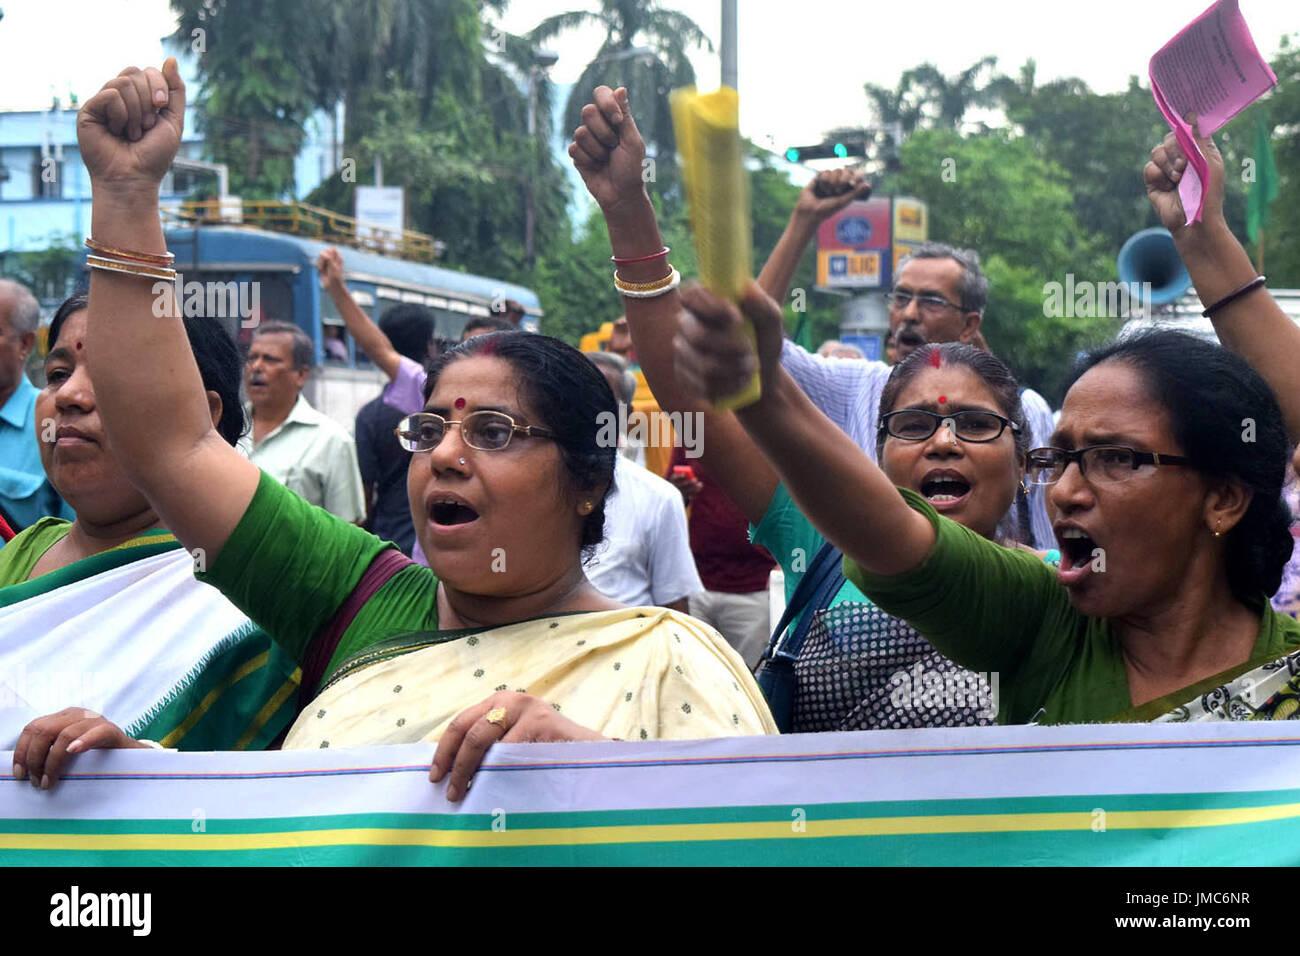 Kolkata, India. 26th July, 2017. Amra Bangali a Bengali activist group holds a rally demanding arrest of Gorkha Jana Mukti leader Bimal Gurung. Credit: Saikat Paul/Pacific Press/Alamy Live News - Stock Image